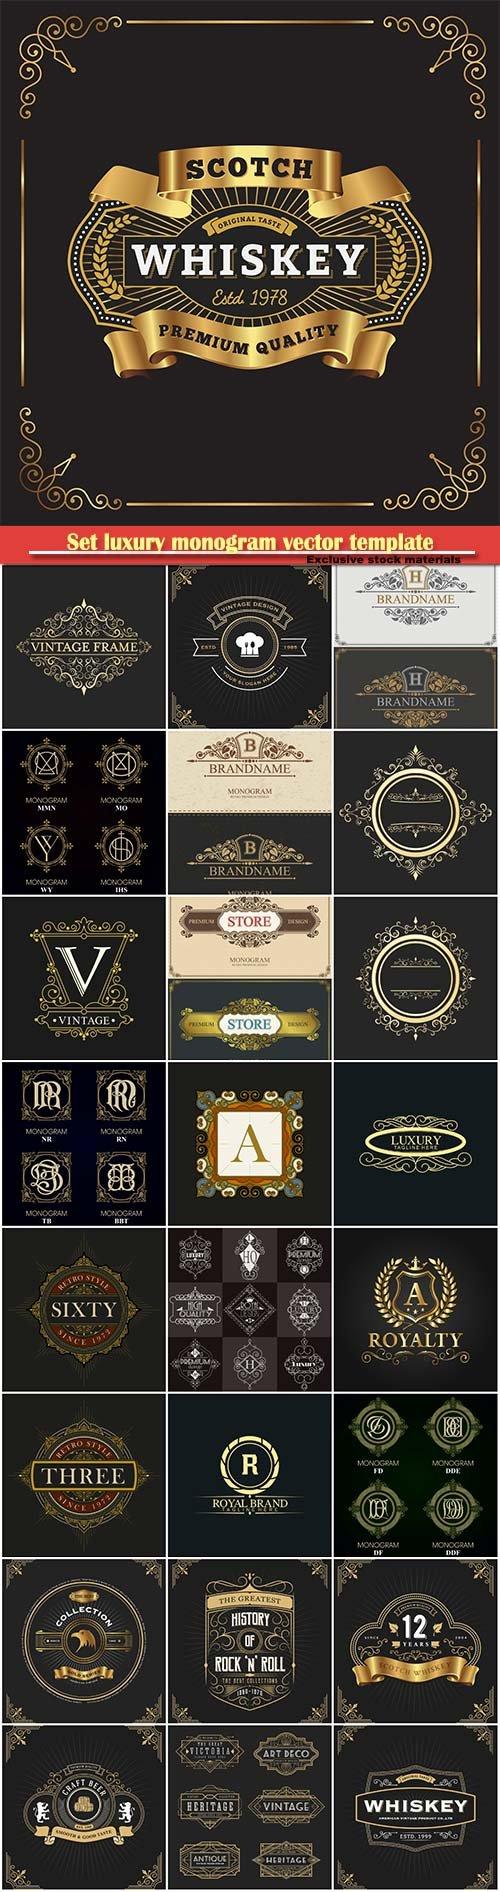 Set luxury monogram vector template, logos, badges, symbols # 13